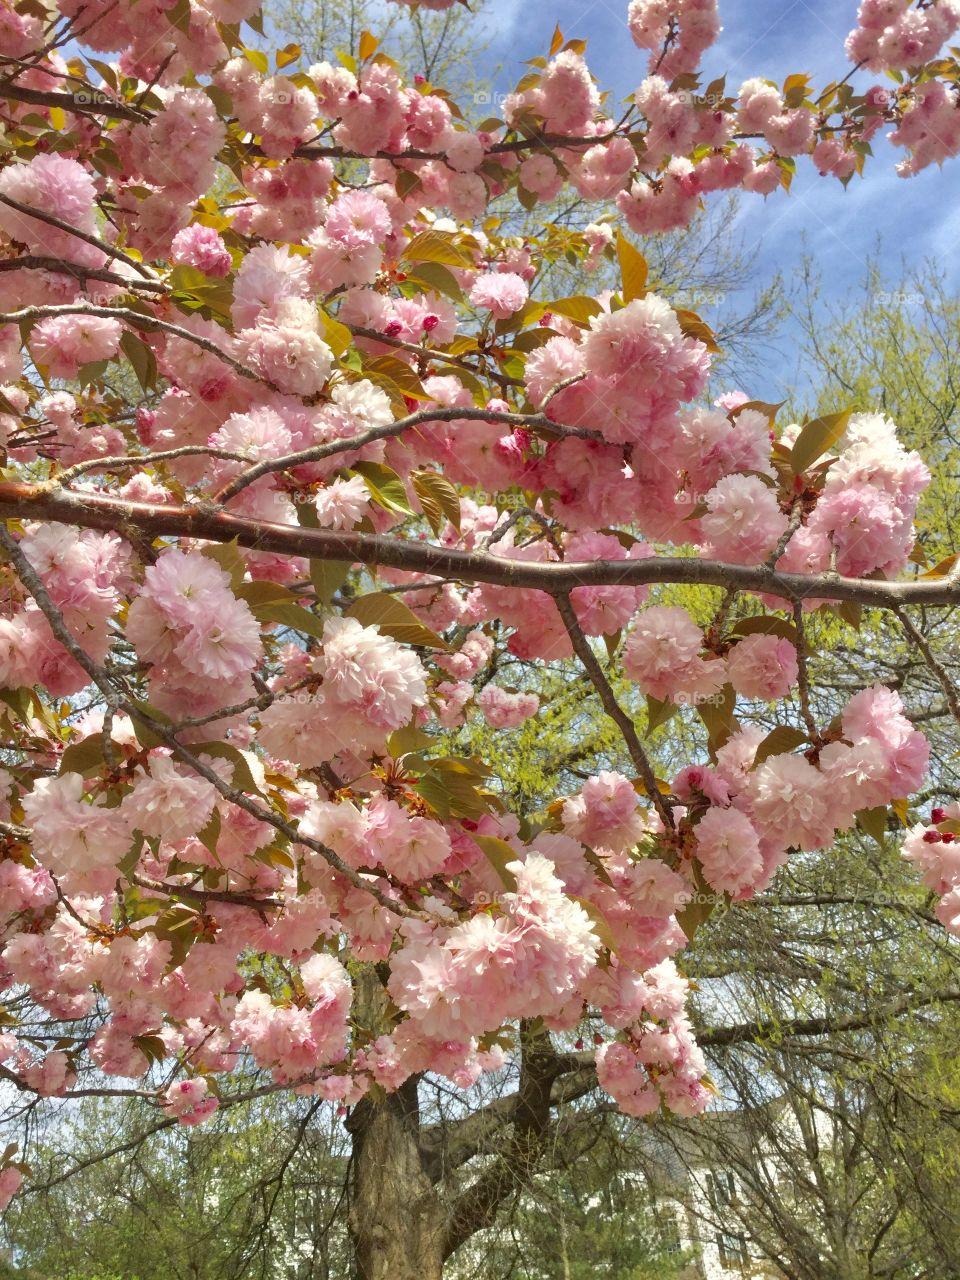 Mesmerized by cherry flowers everywhere